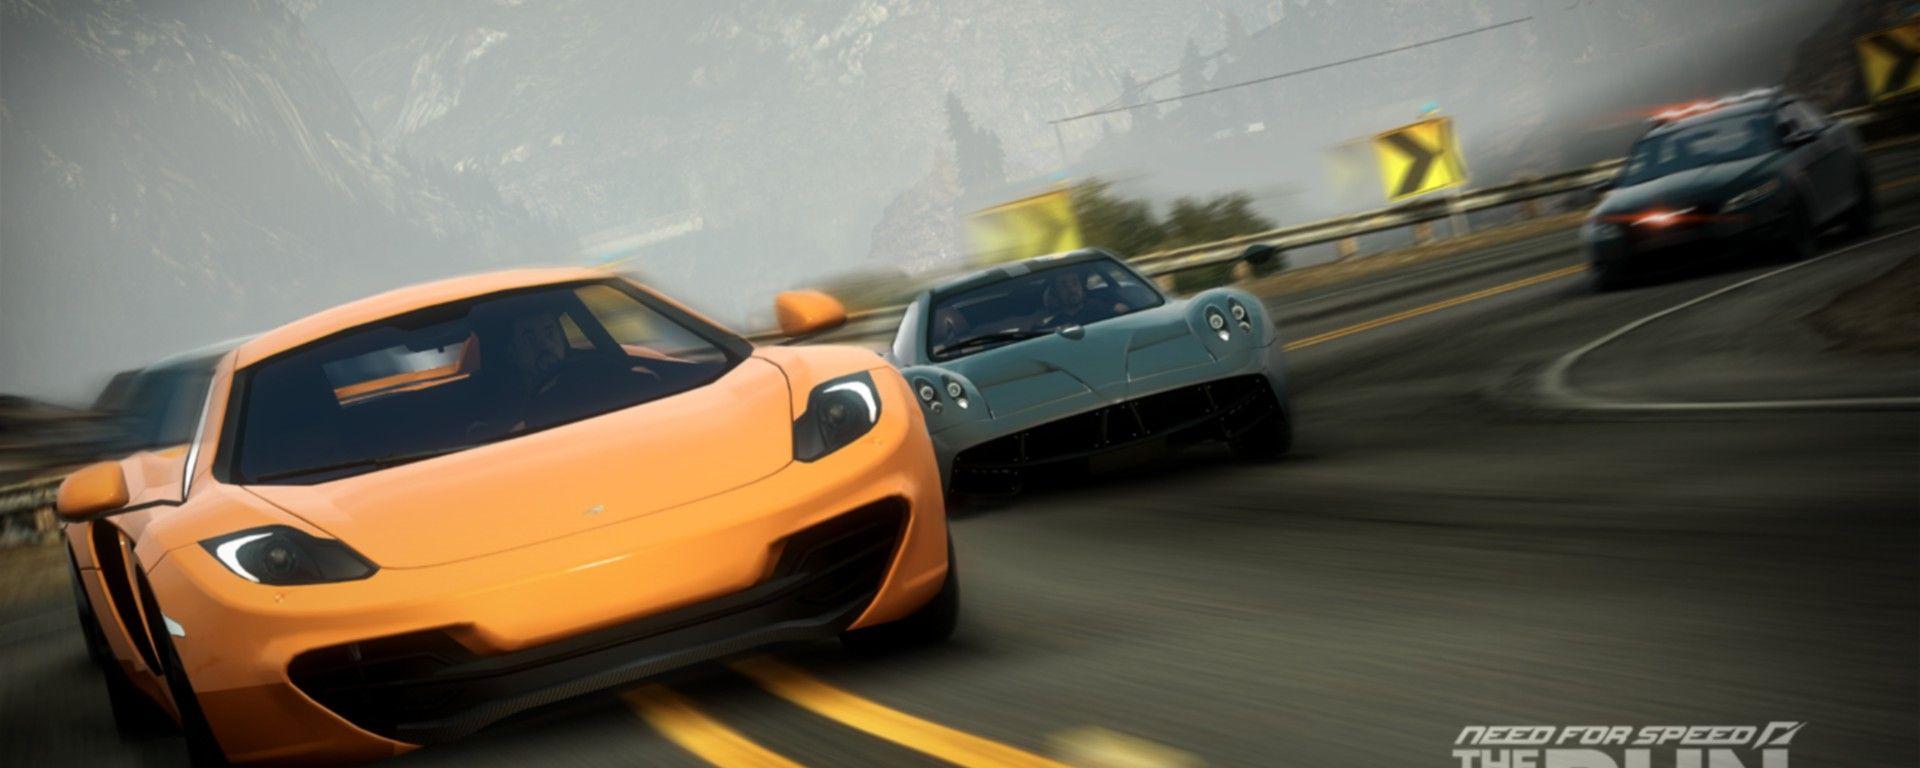 Need For Speed diventa un Film